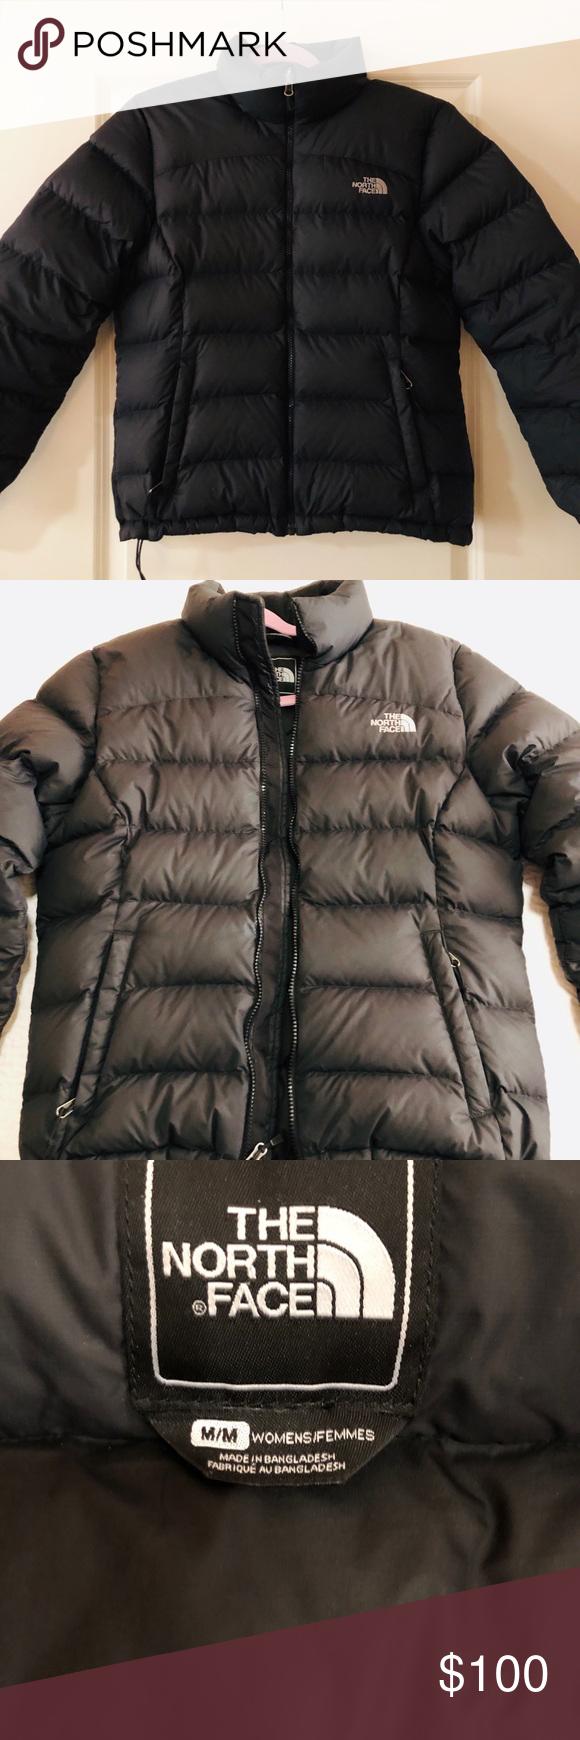 Black Puffer North Face Coat North Face Coat Black Puffer Winter Coat Warmest [ 1740 x 580 Pixel ]